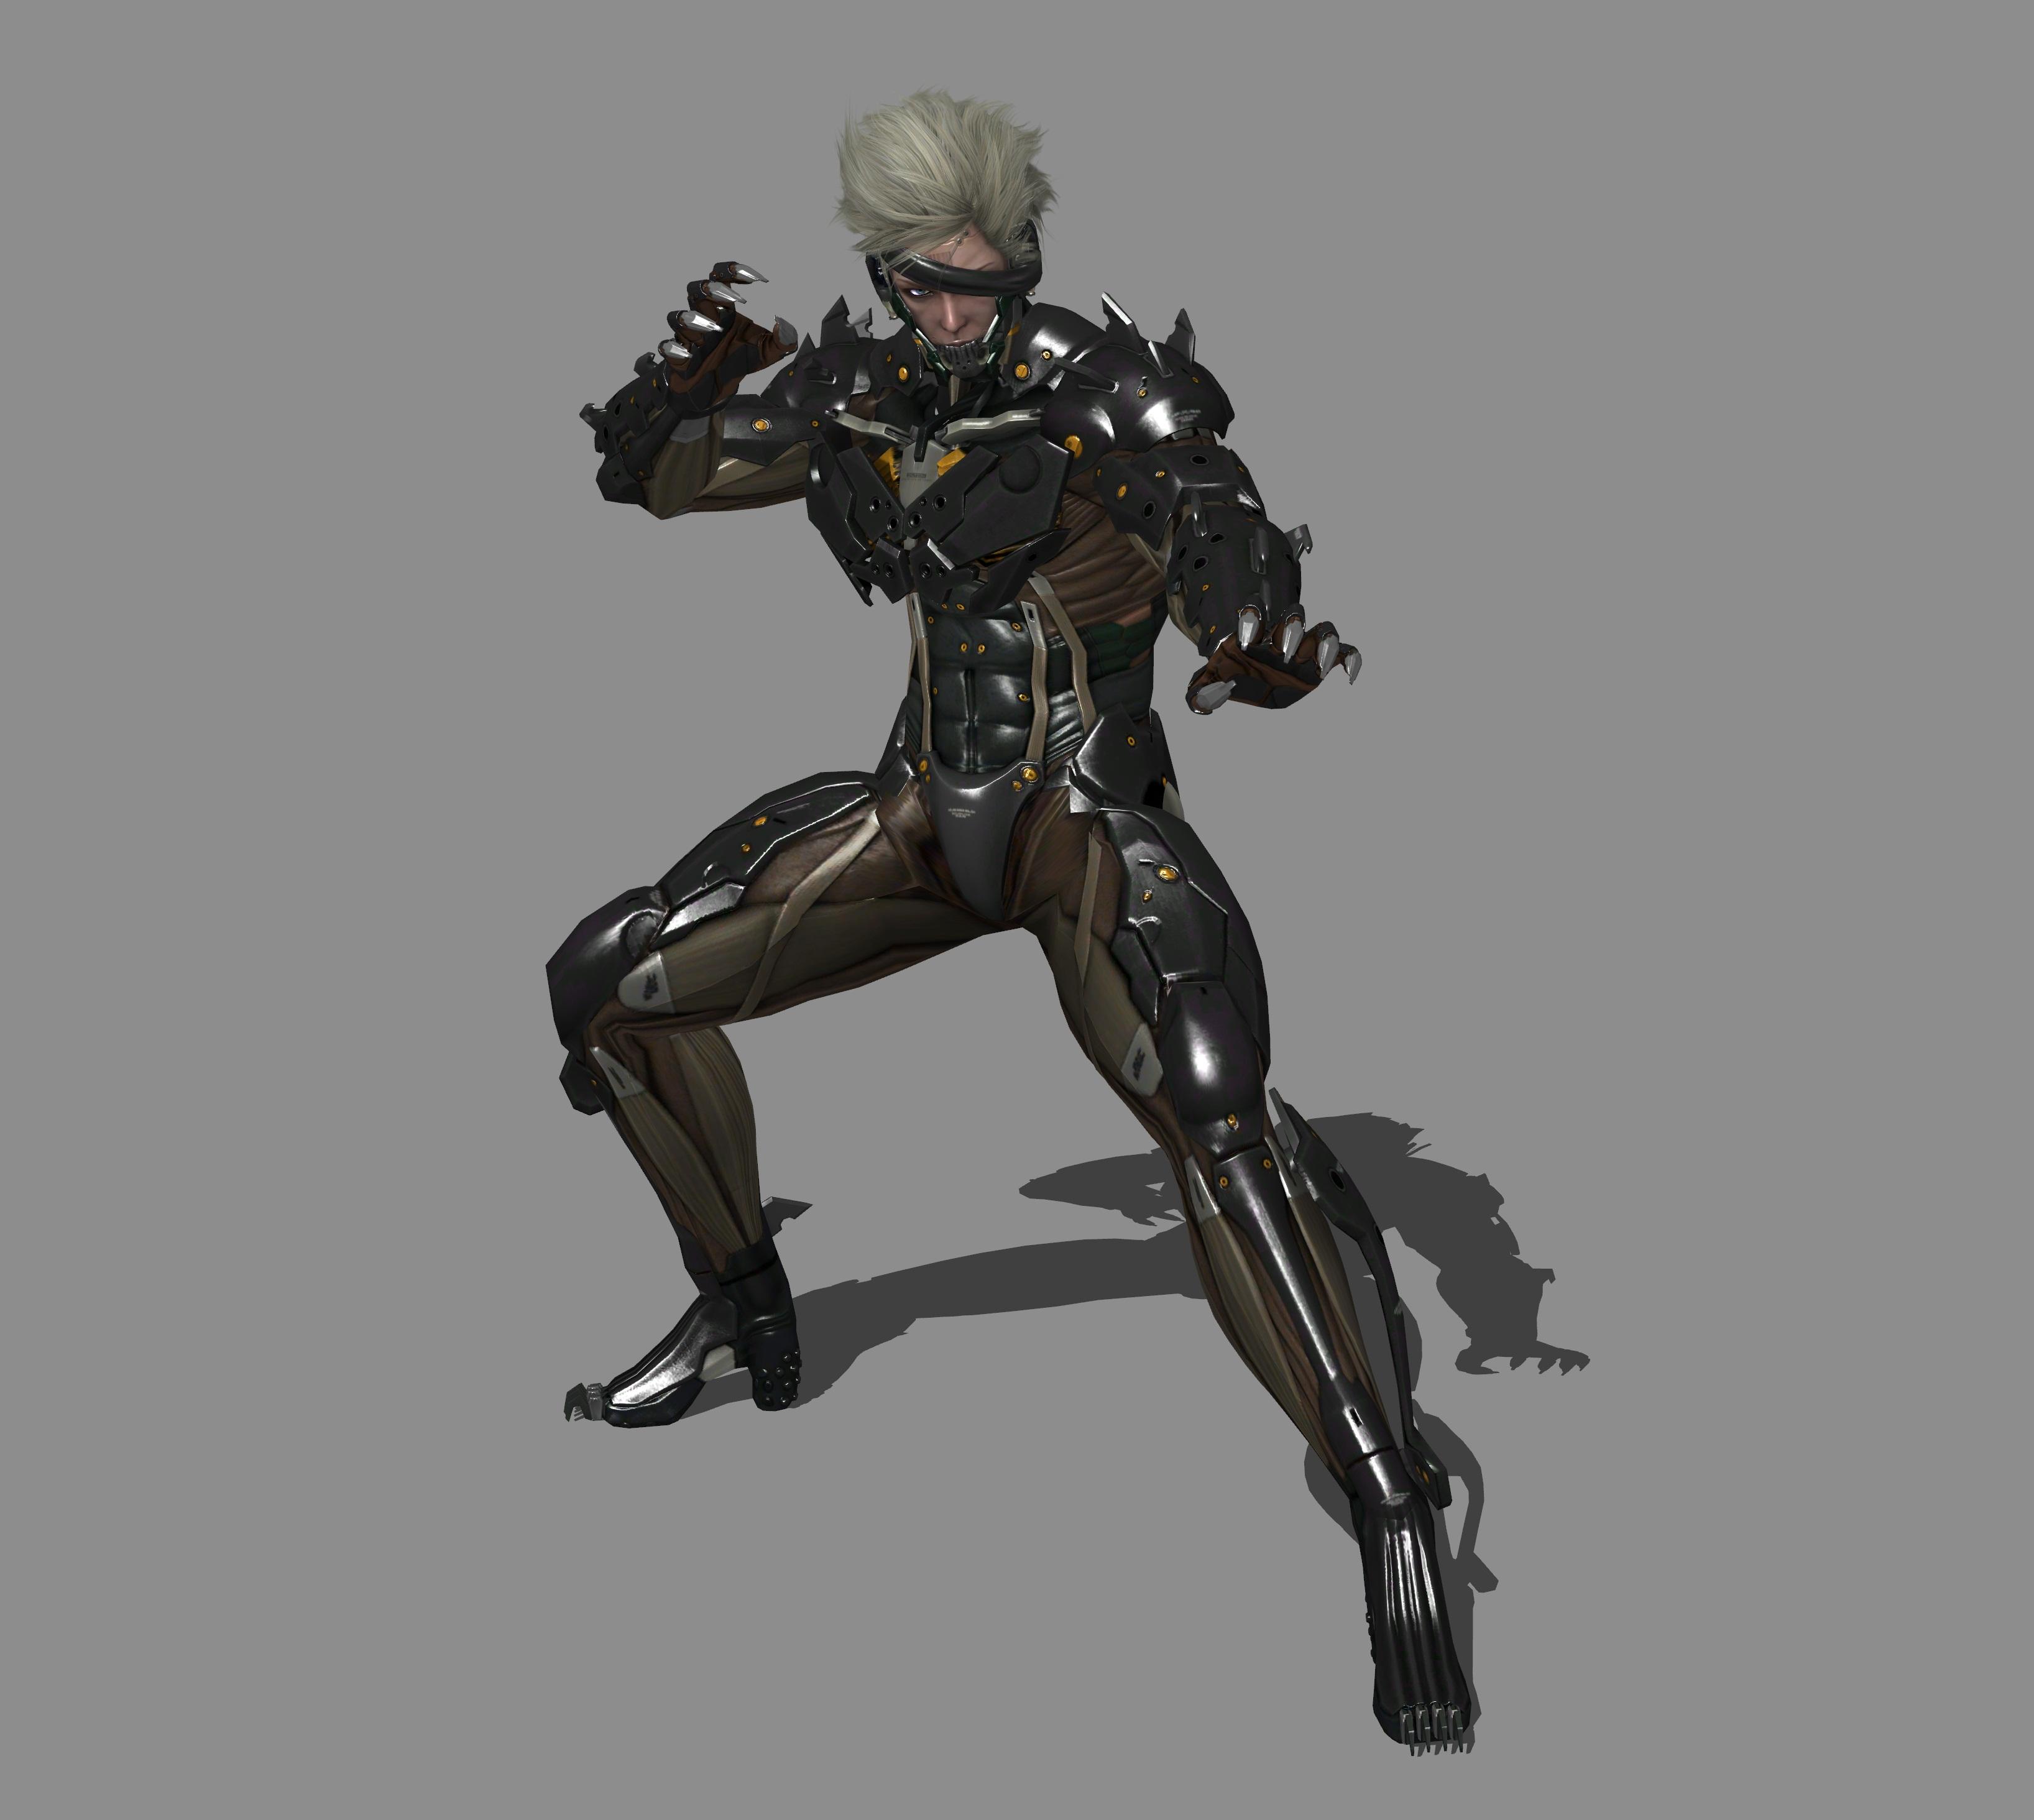 Metal Gear Rising Revengeance Raiden Claw Pose By Ishikahiruma On Deviantart